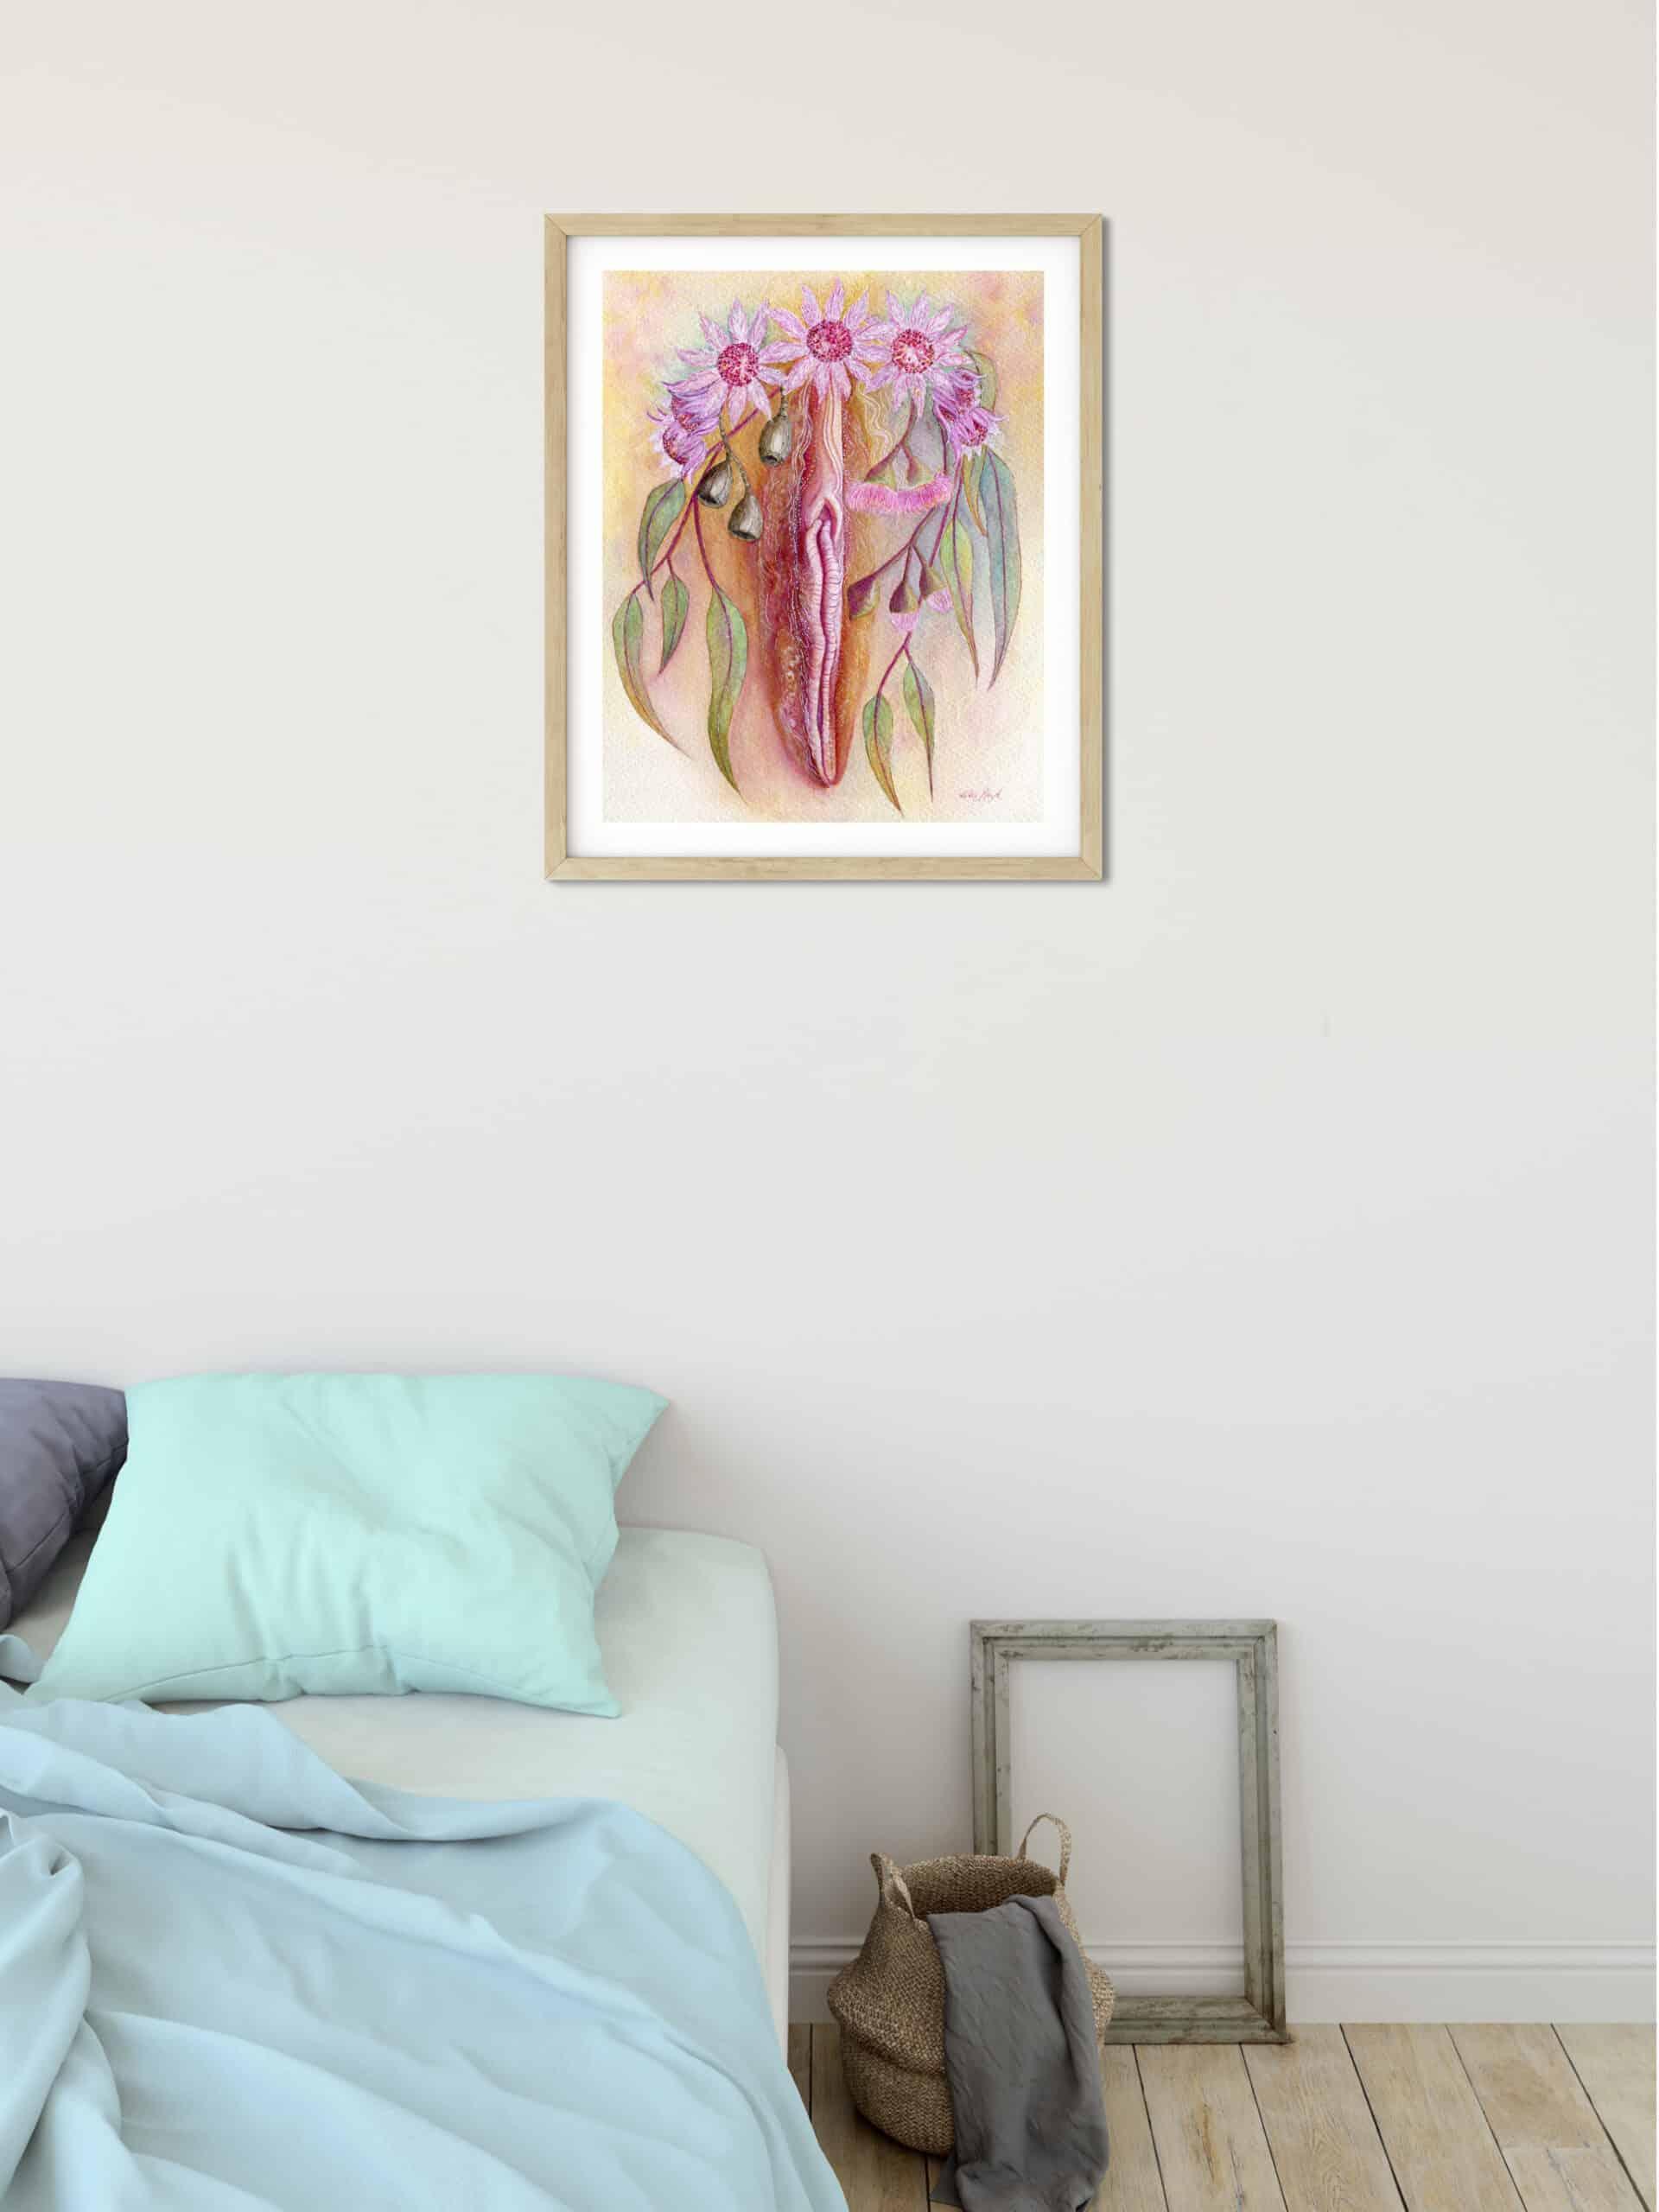 Life blossoms framed wall